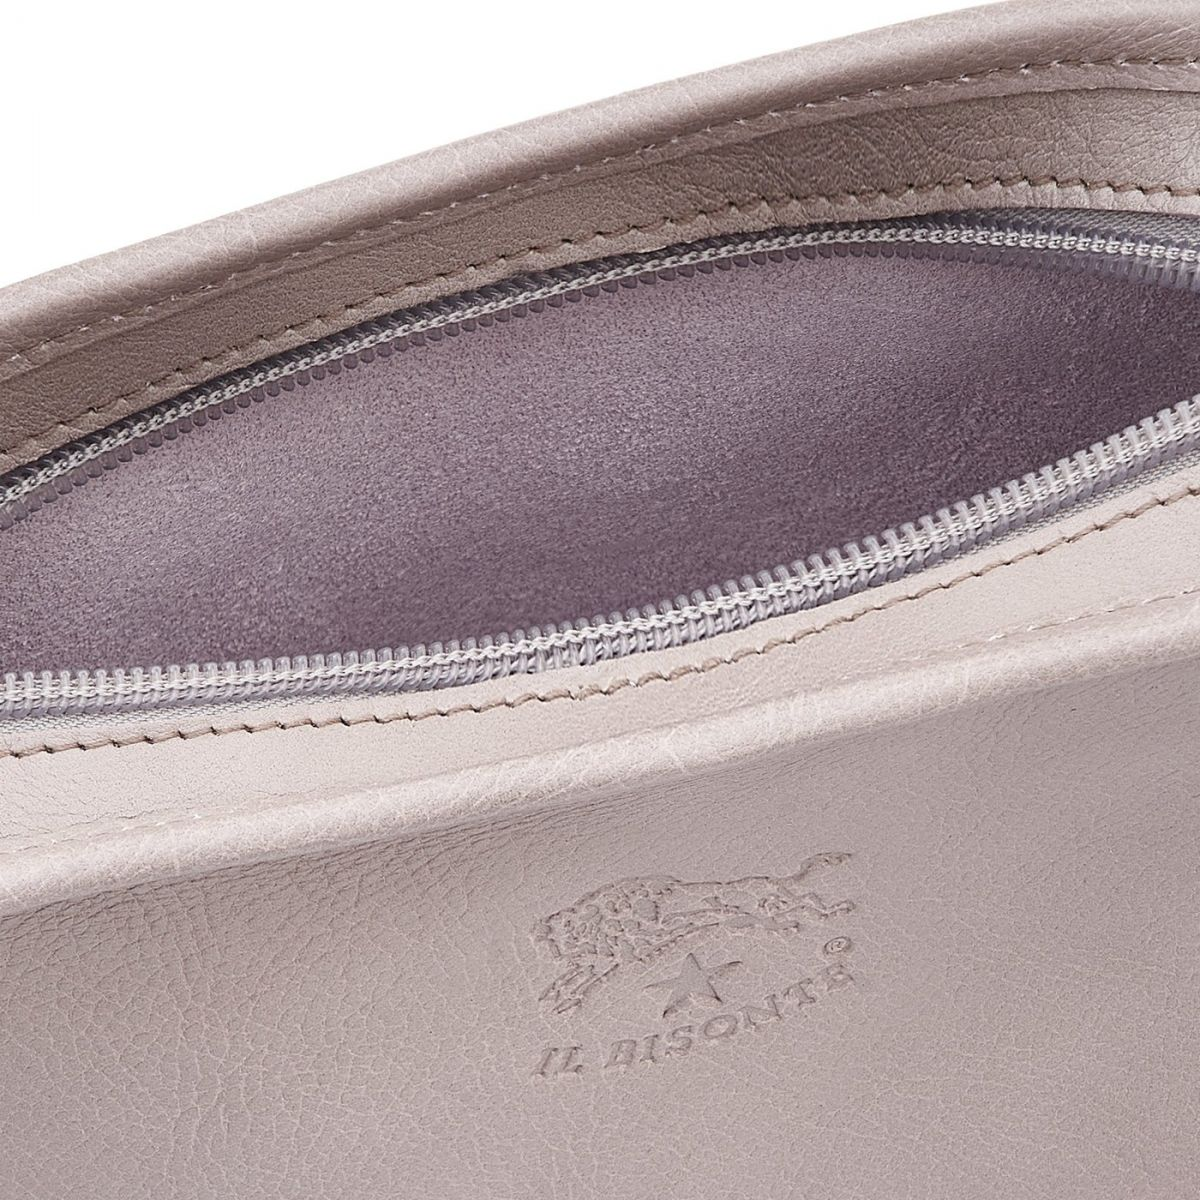 Women's Crossbody Bag in Cowhide Leather color Mauve - BCR009 | Details